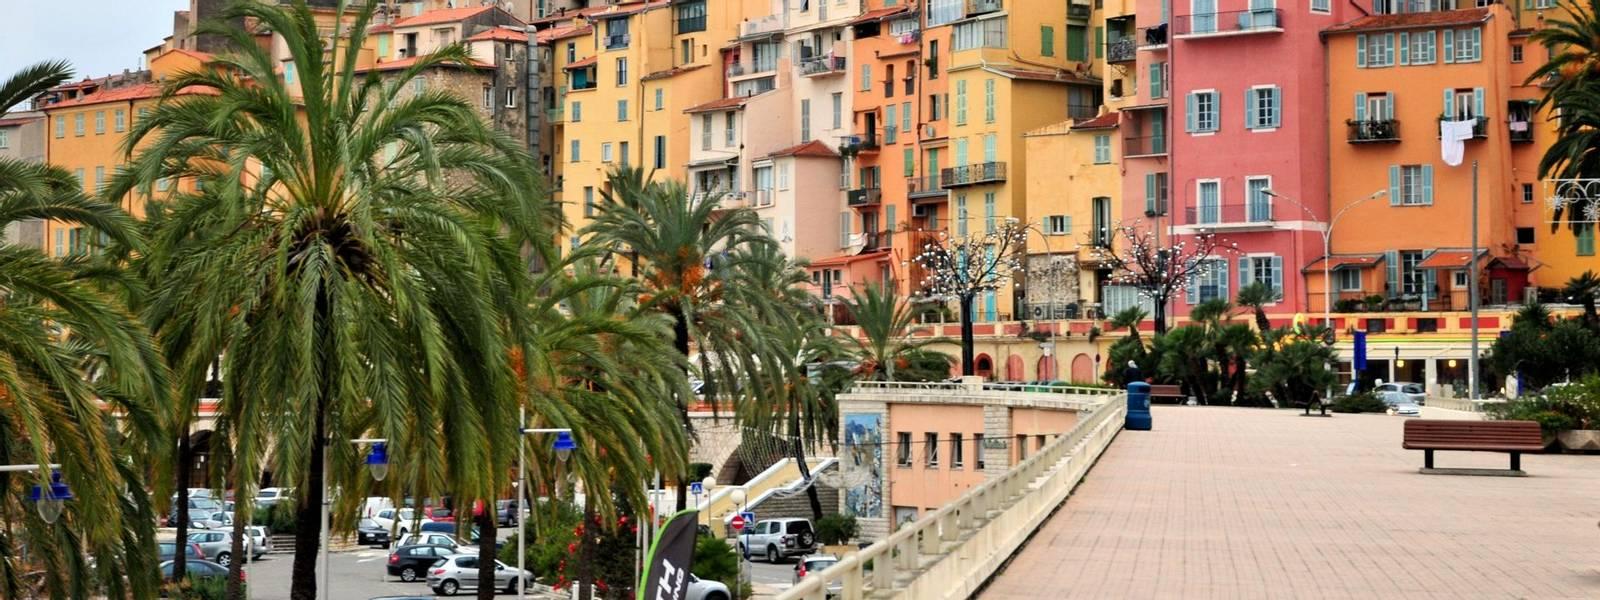 France - French Riviera Bridge Players - AdobeStock_28852064.jpeg